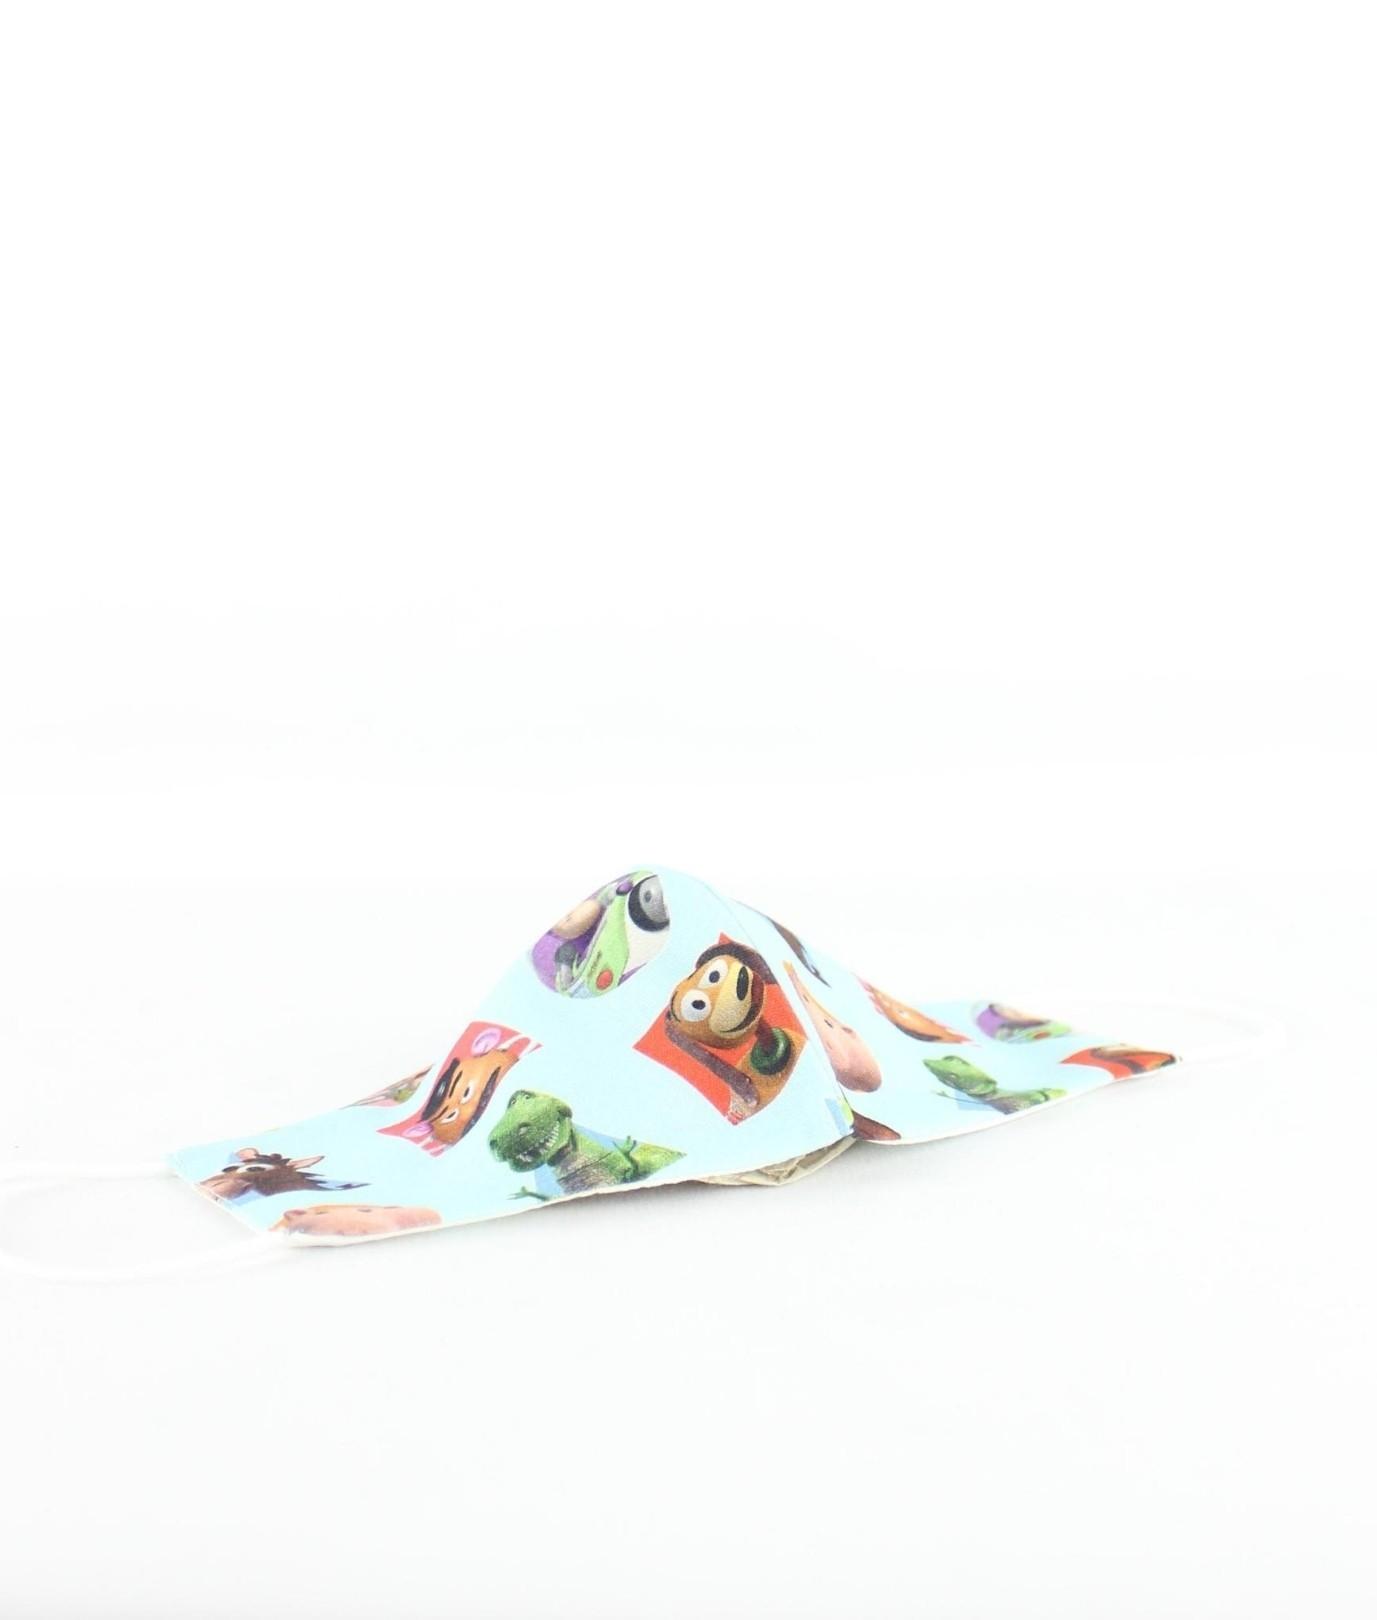 Mascara Yesitex - Infantil AH